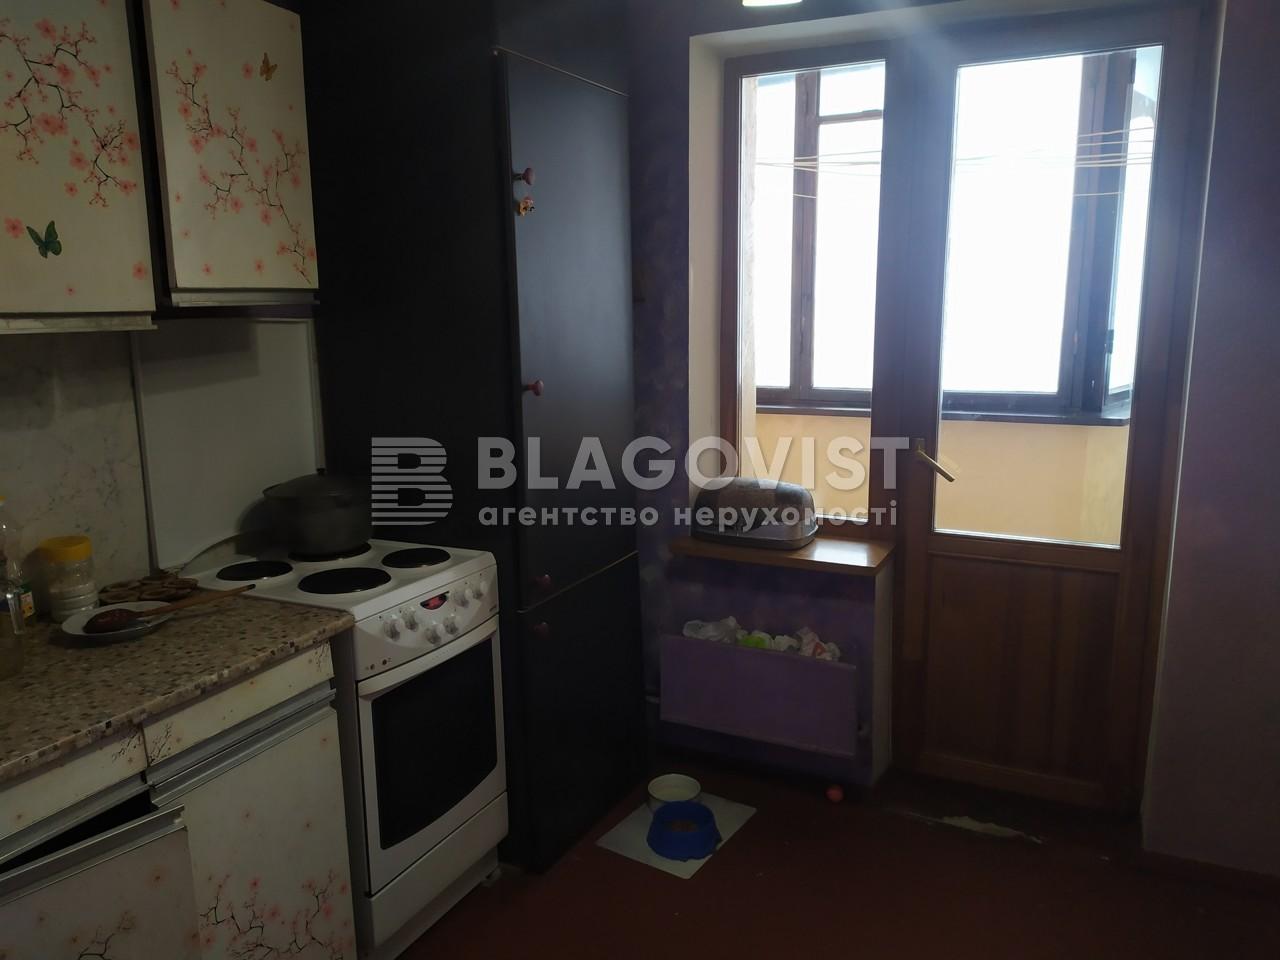 Квартира Z-670902, Драйзера Теодора, 38, Киев - Фото 11